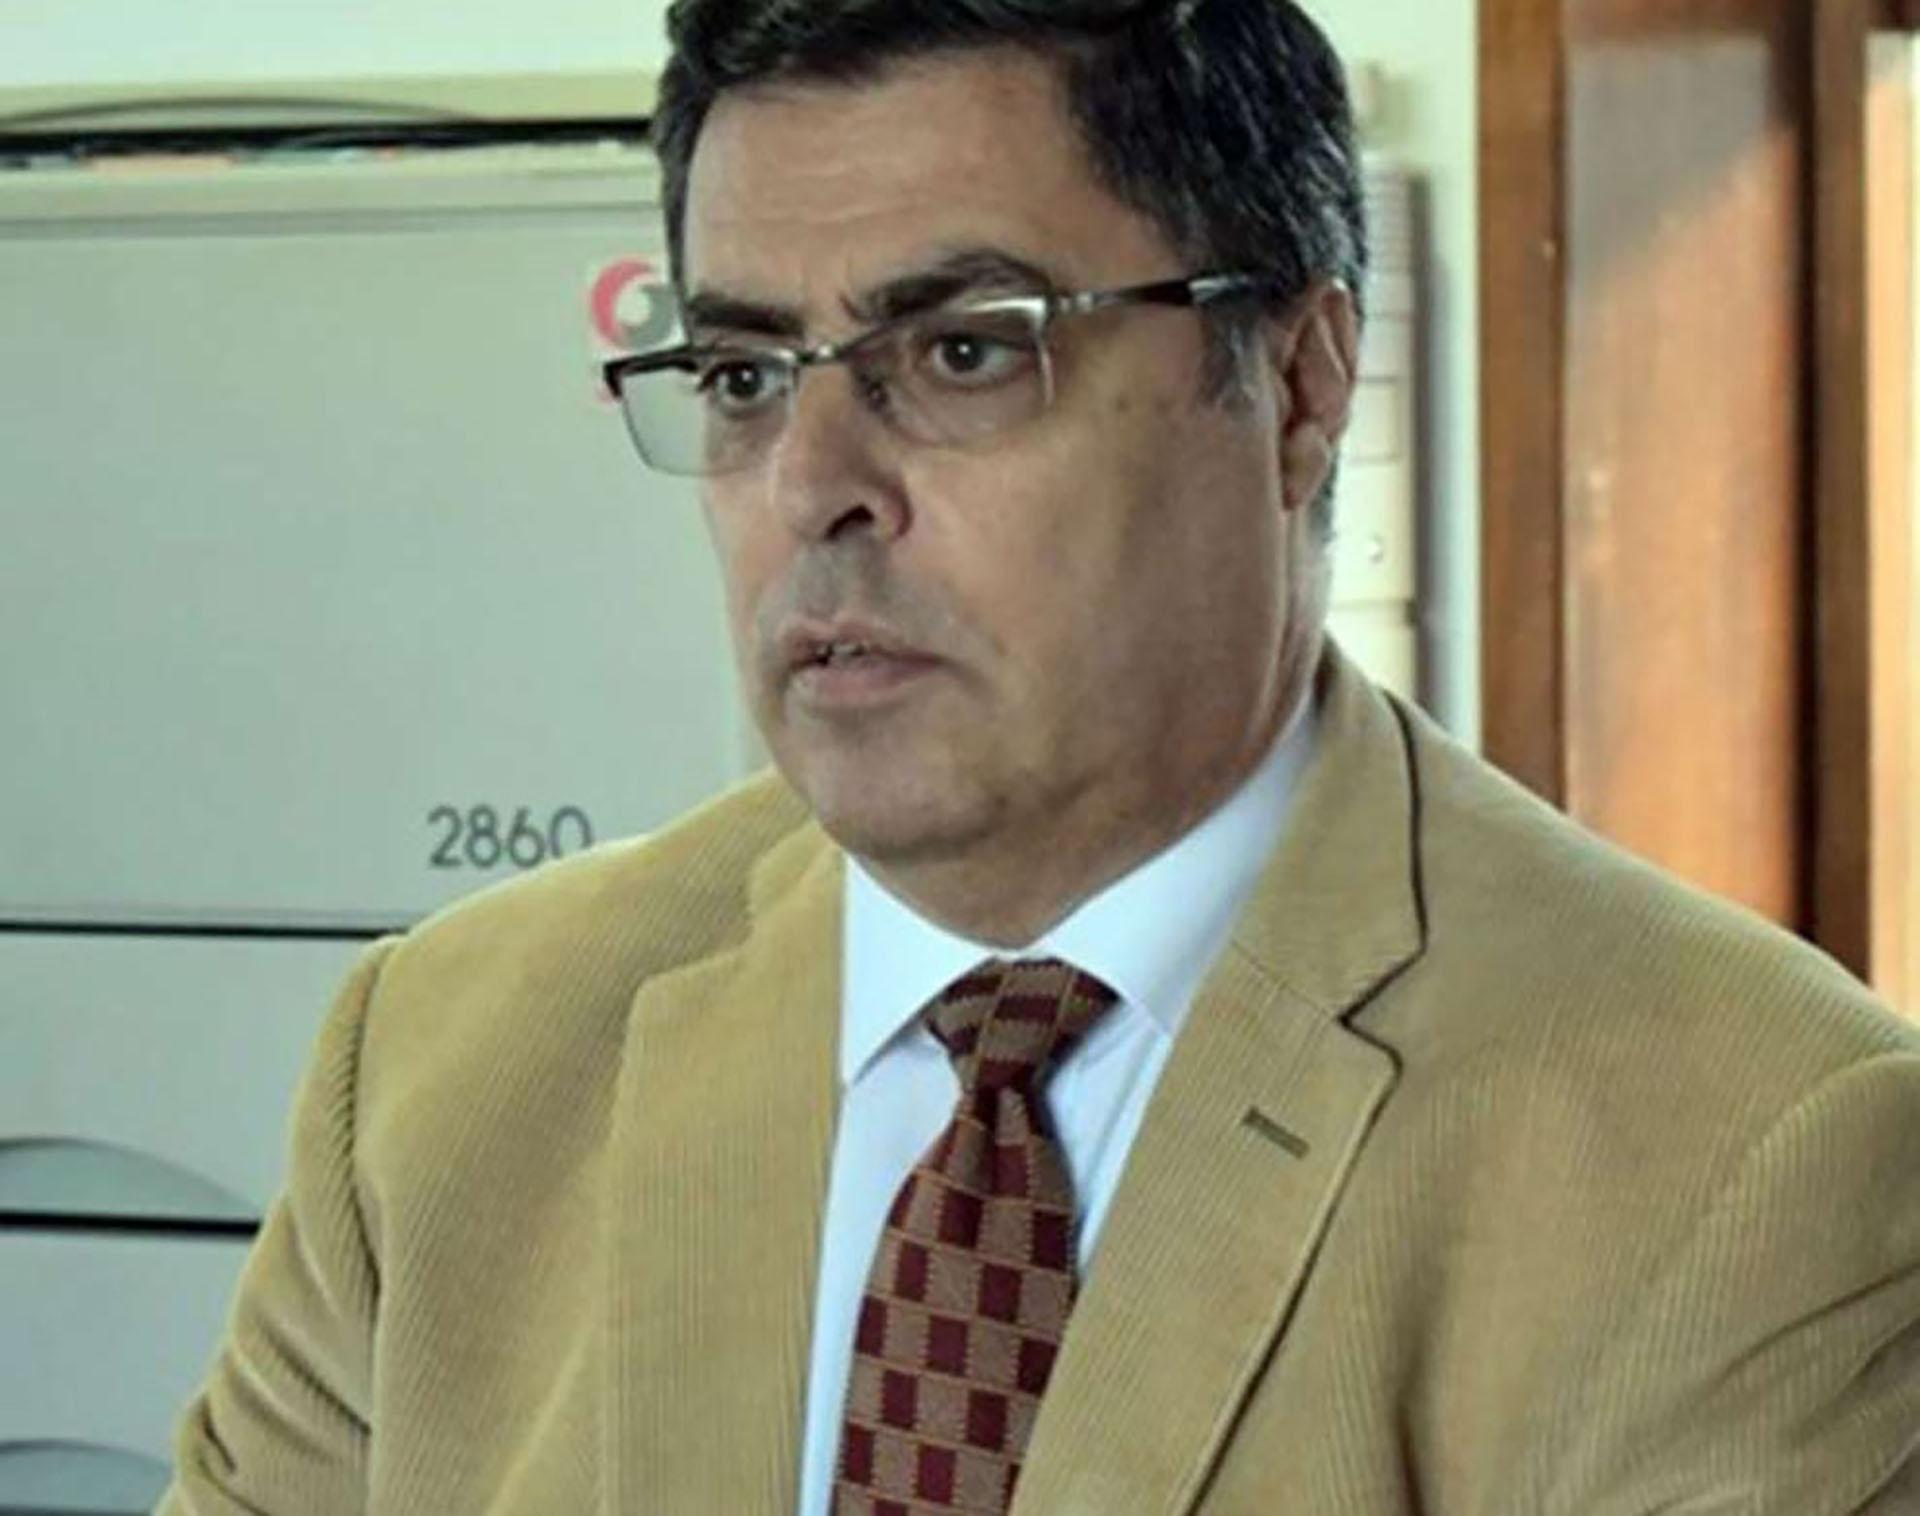 Investigacion al Intendente Melella en Rio Grande Raul Sahade